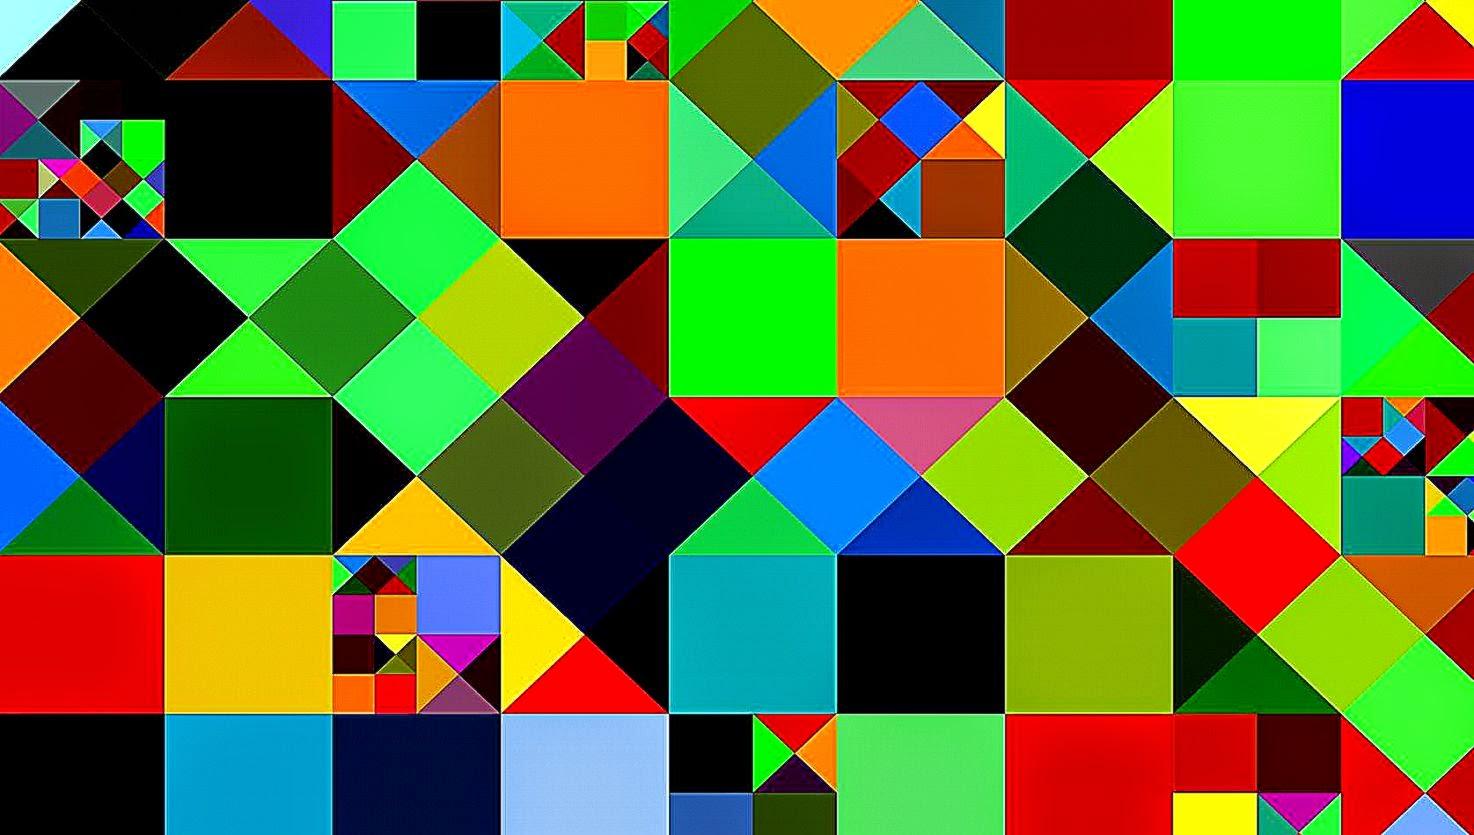 Geometric Shapes Cartoon Stock Photos. Royalty Free Geometric Pictures of all geometric shapes